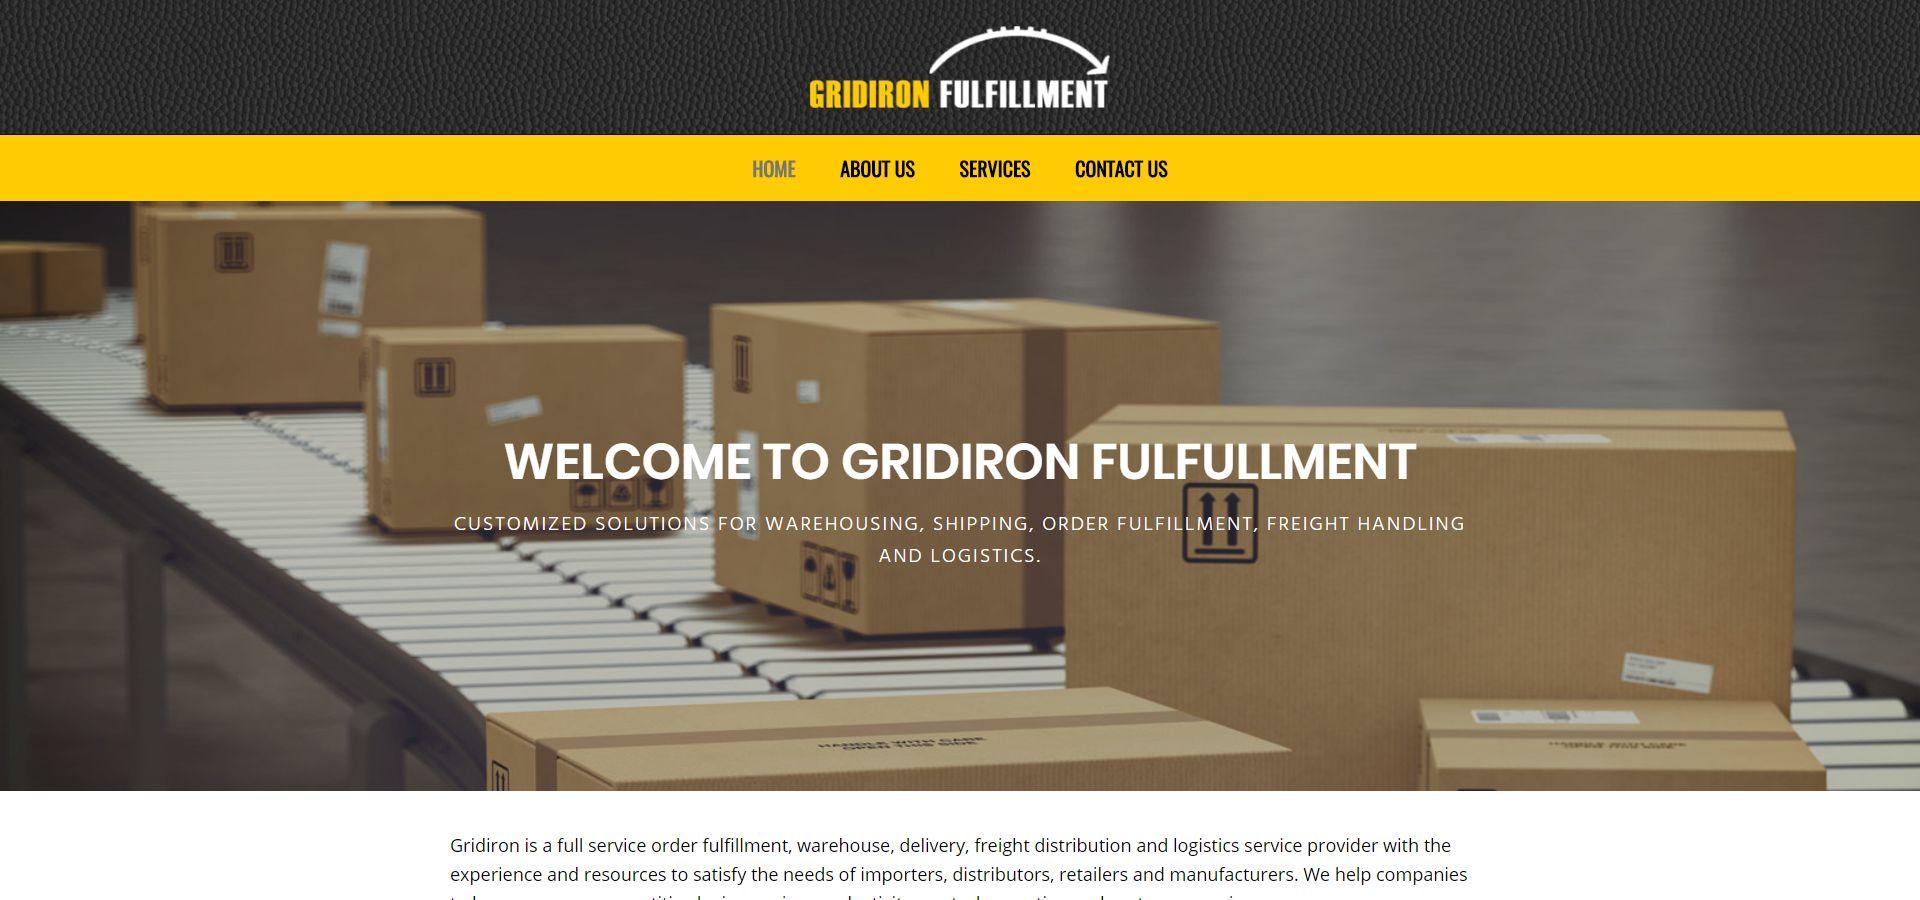 Gridiron Fulfillment website by Webcami